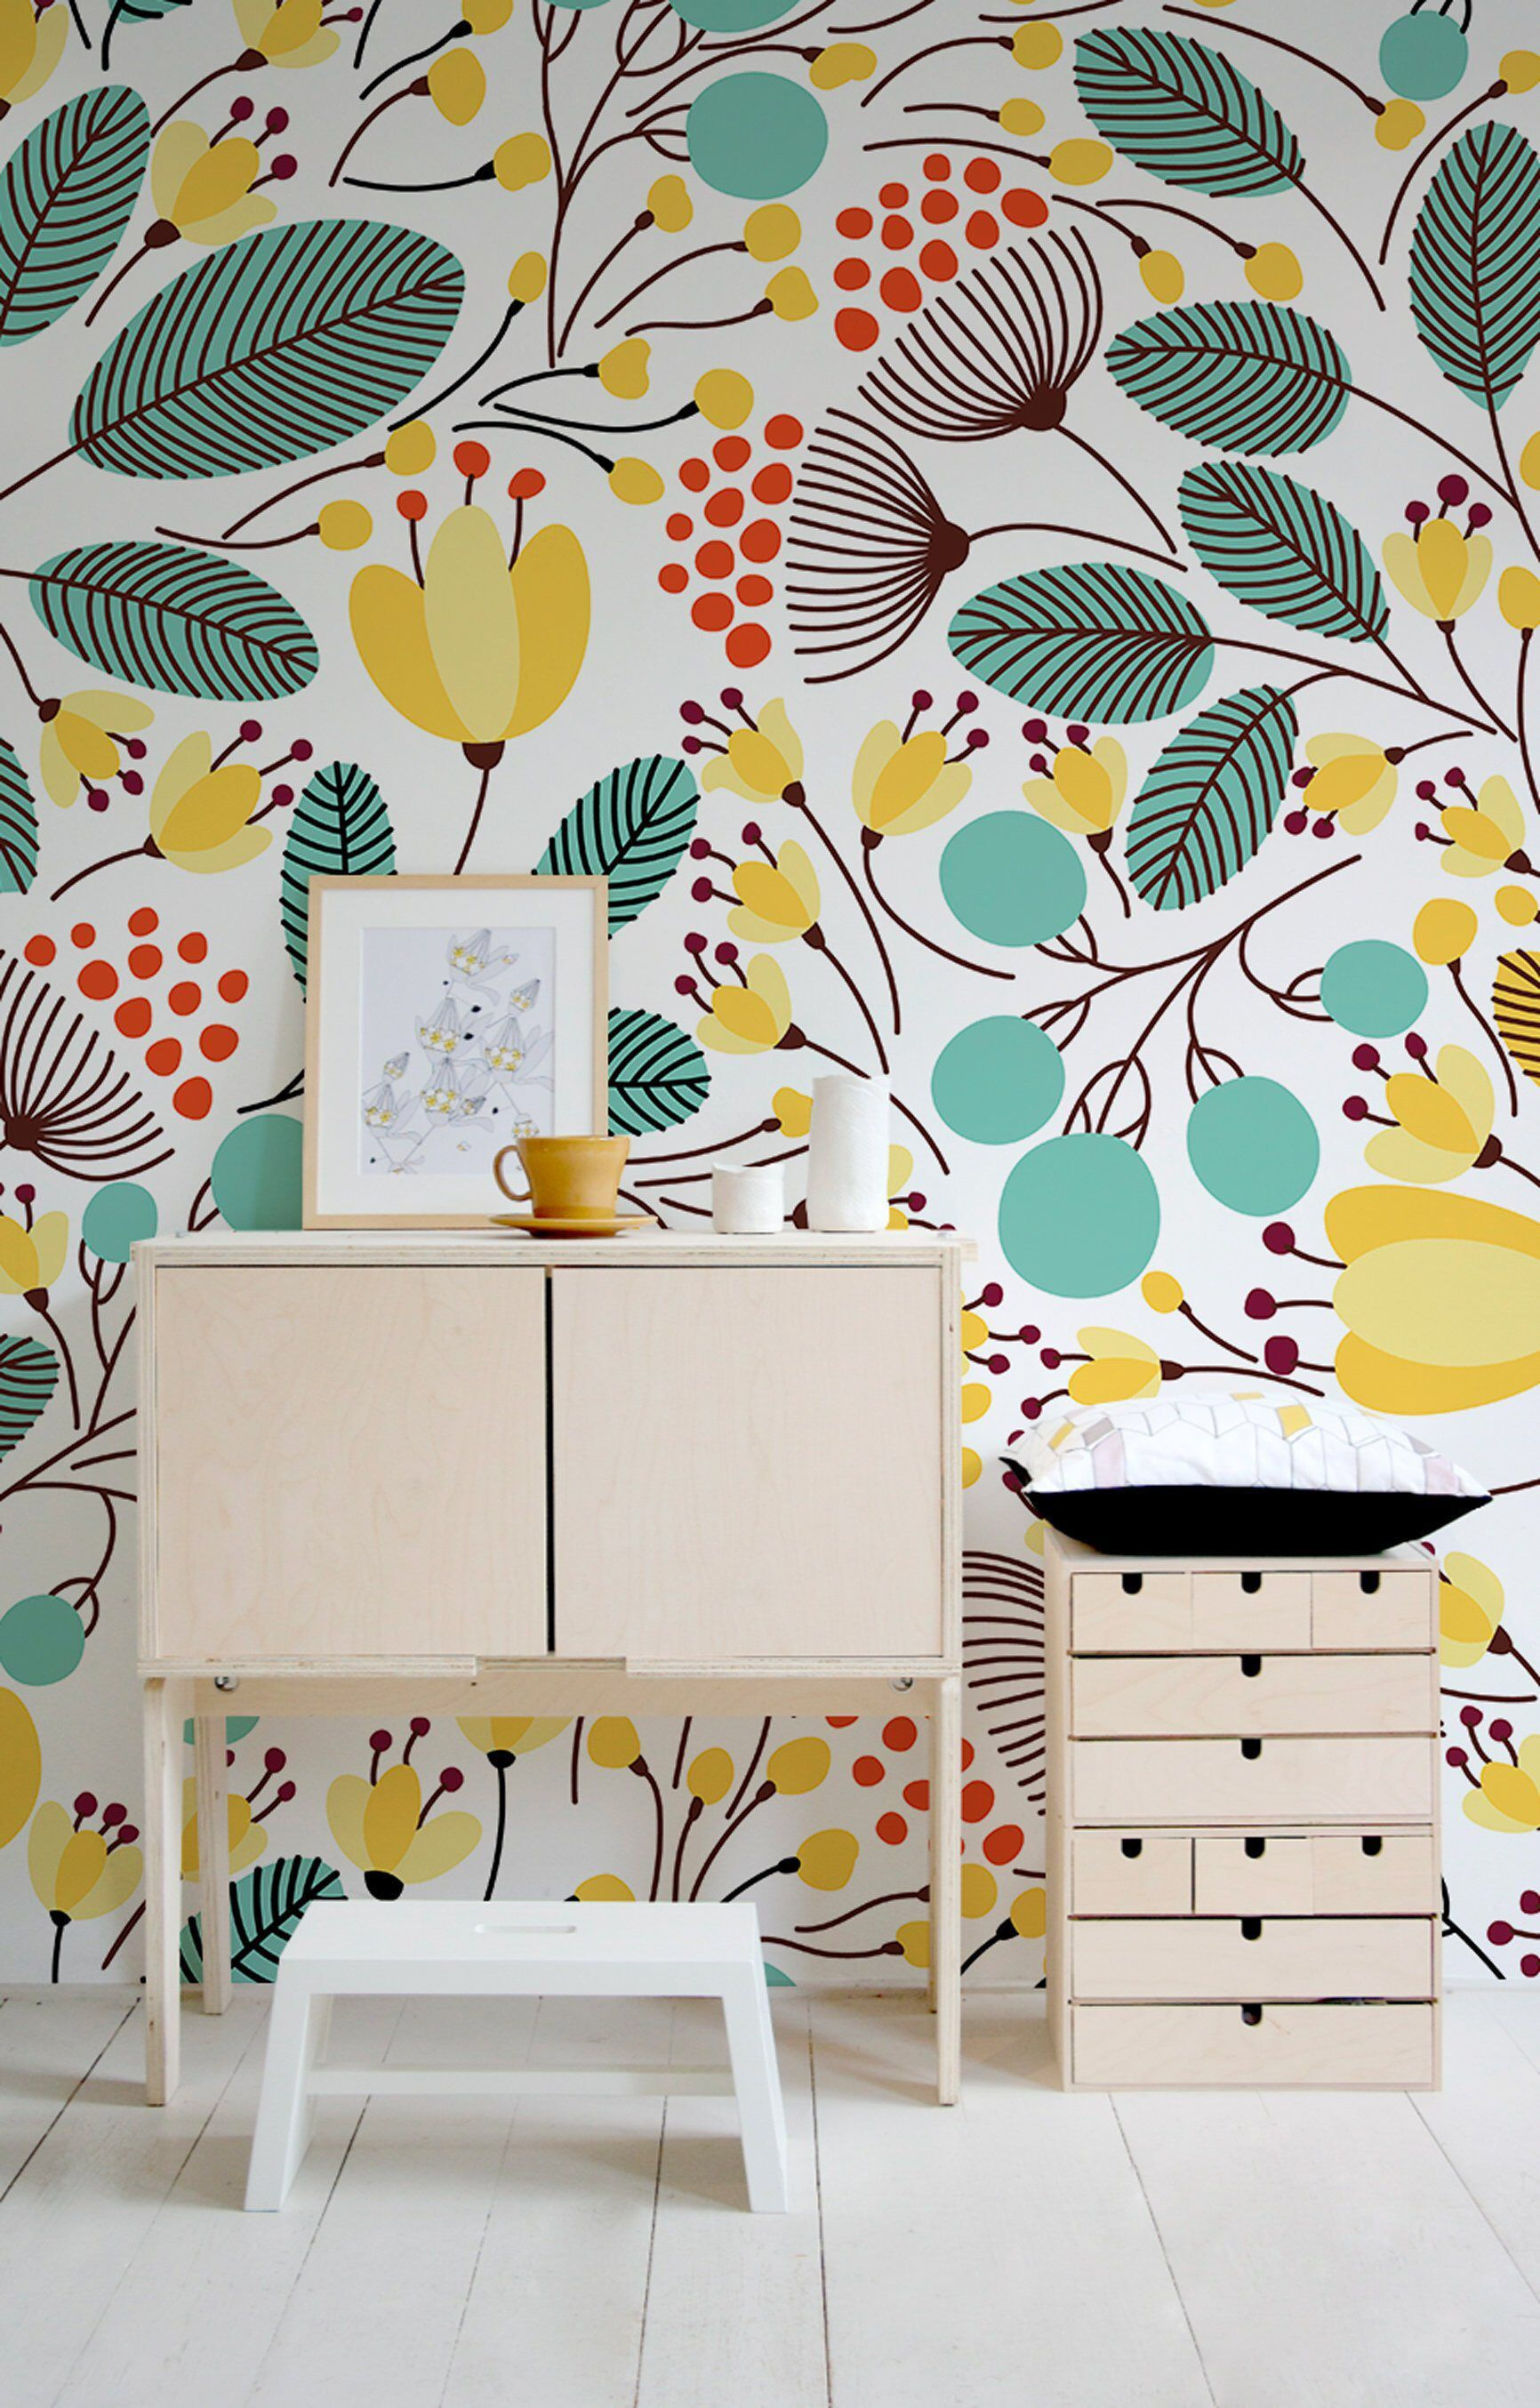 Design Home Wallpaper Watercolor Mural Wall Decor